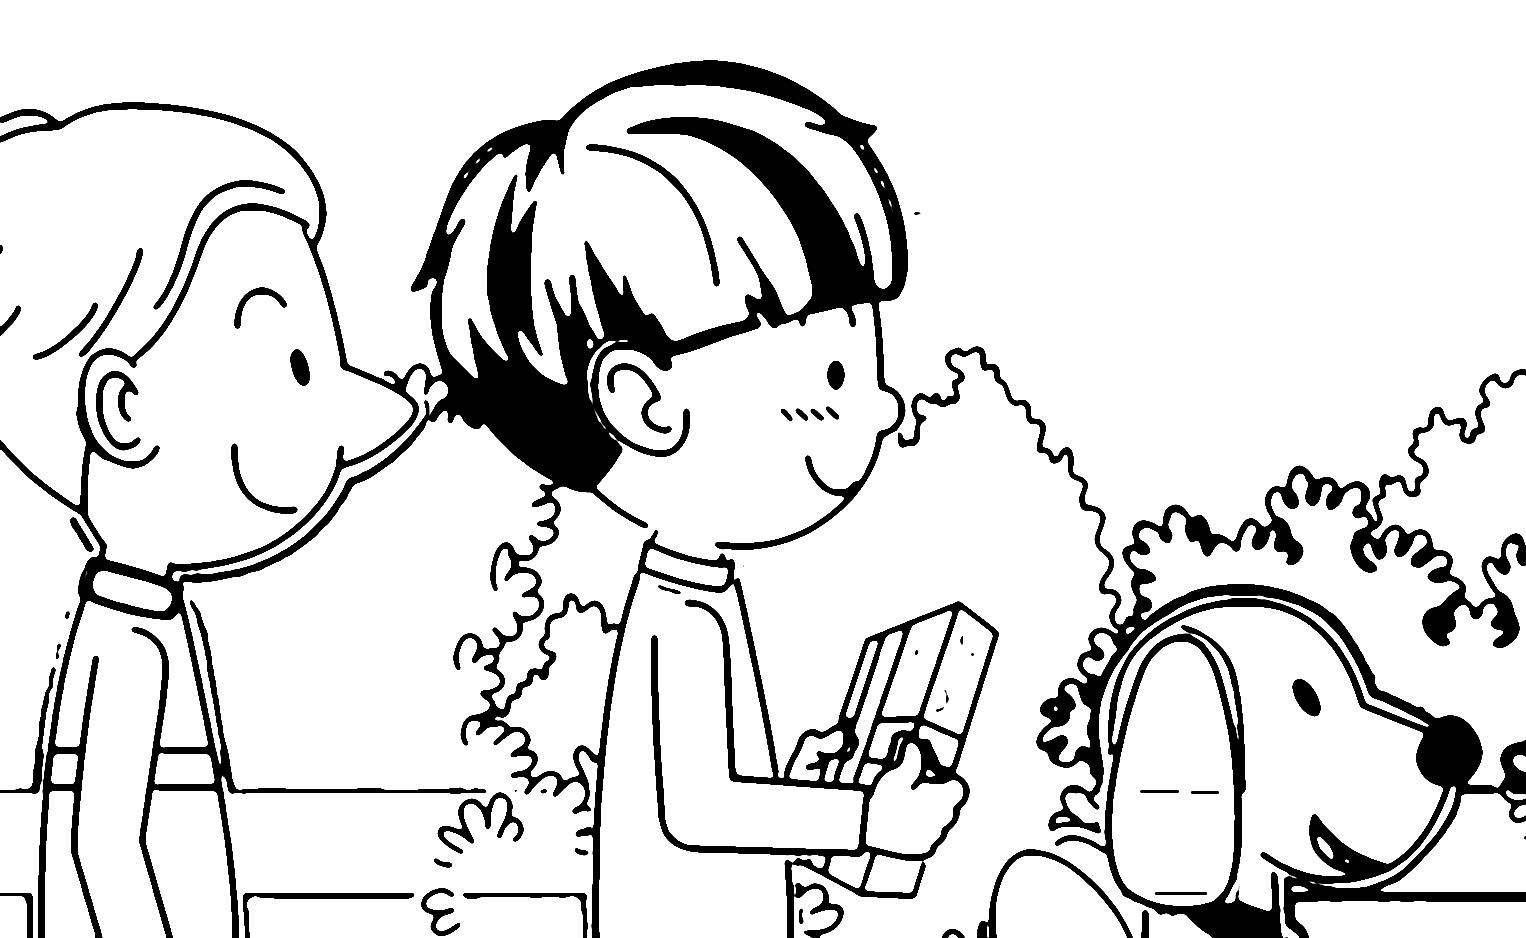 Speaking Cartoon Kids Coloring Page 05